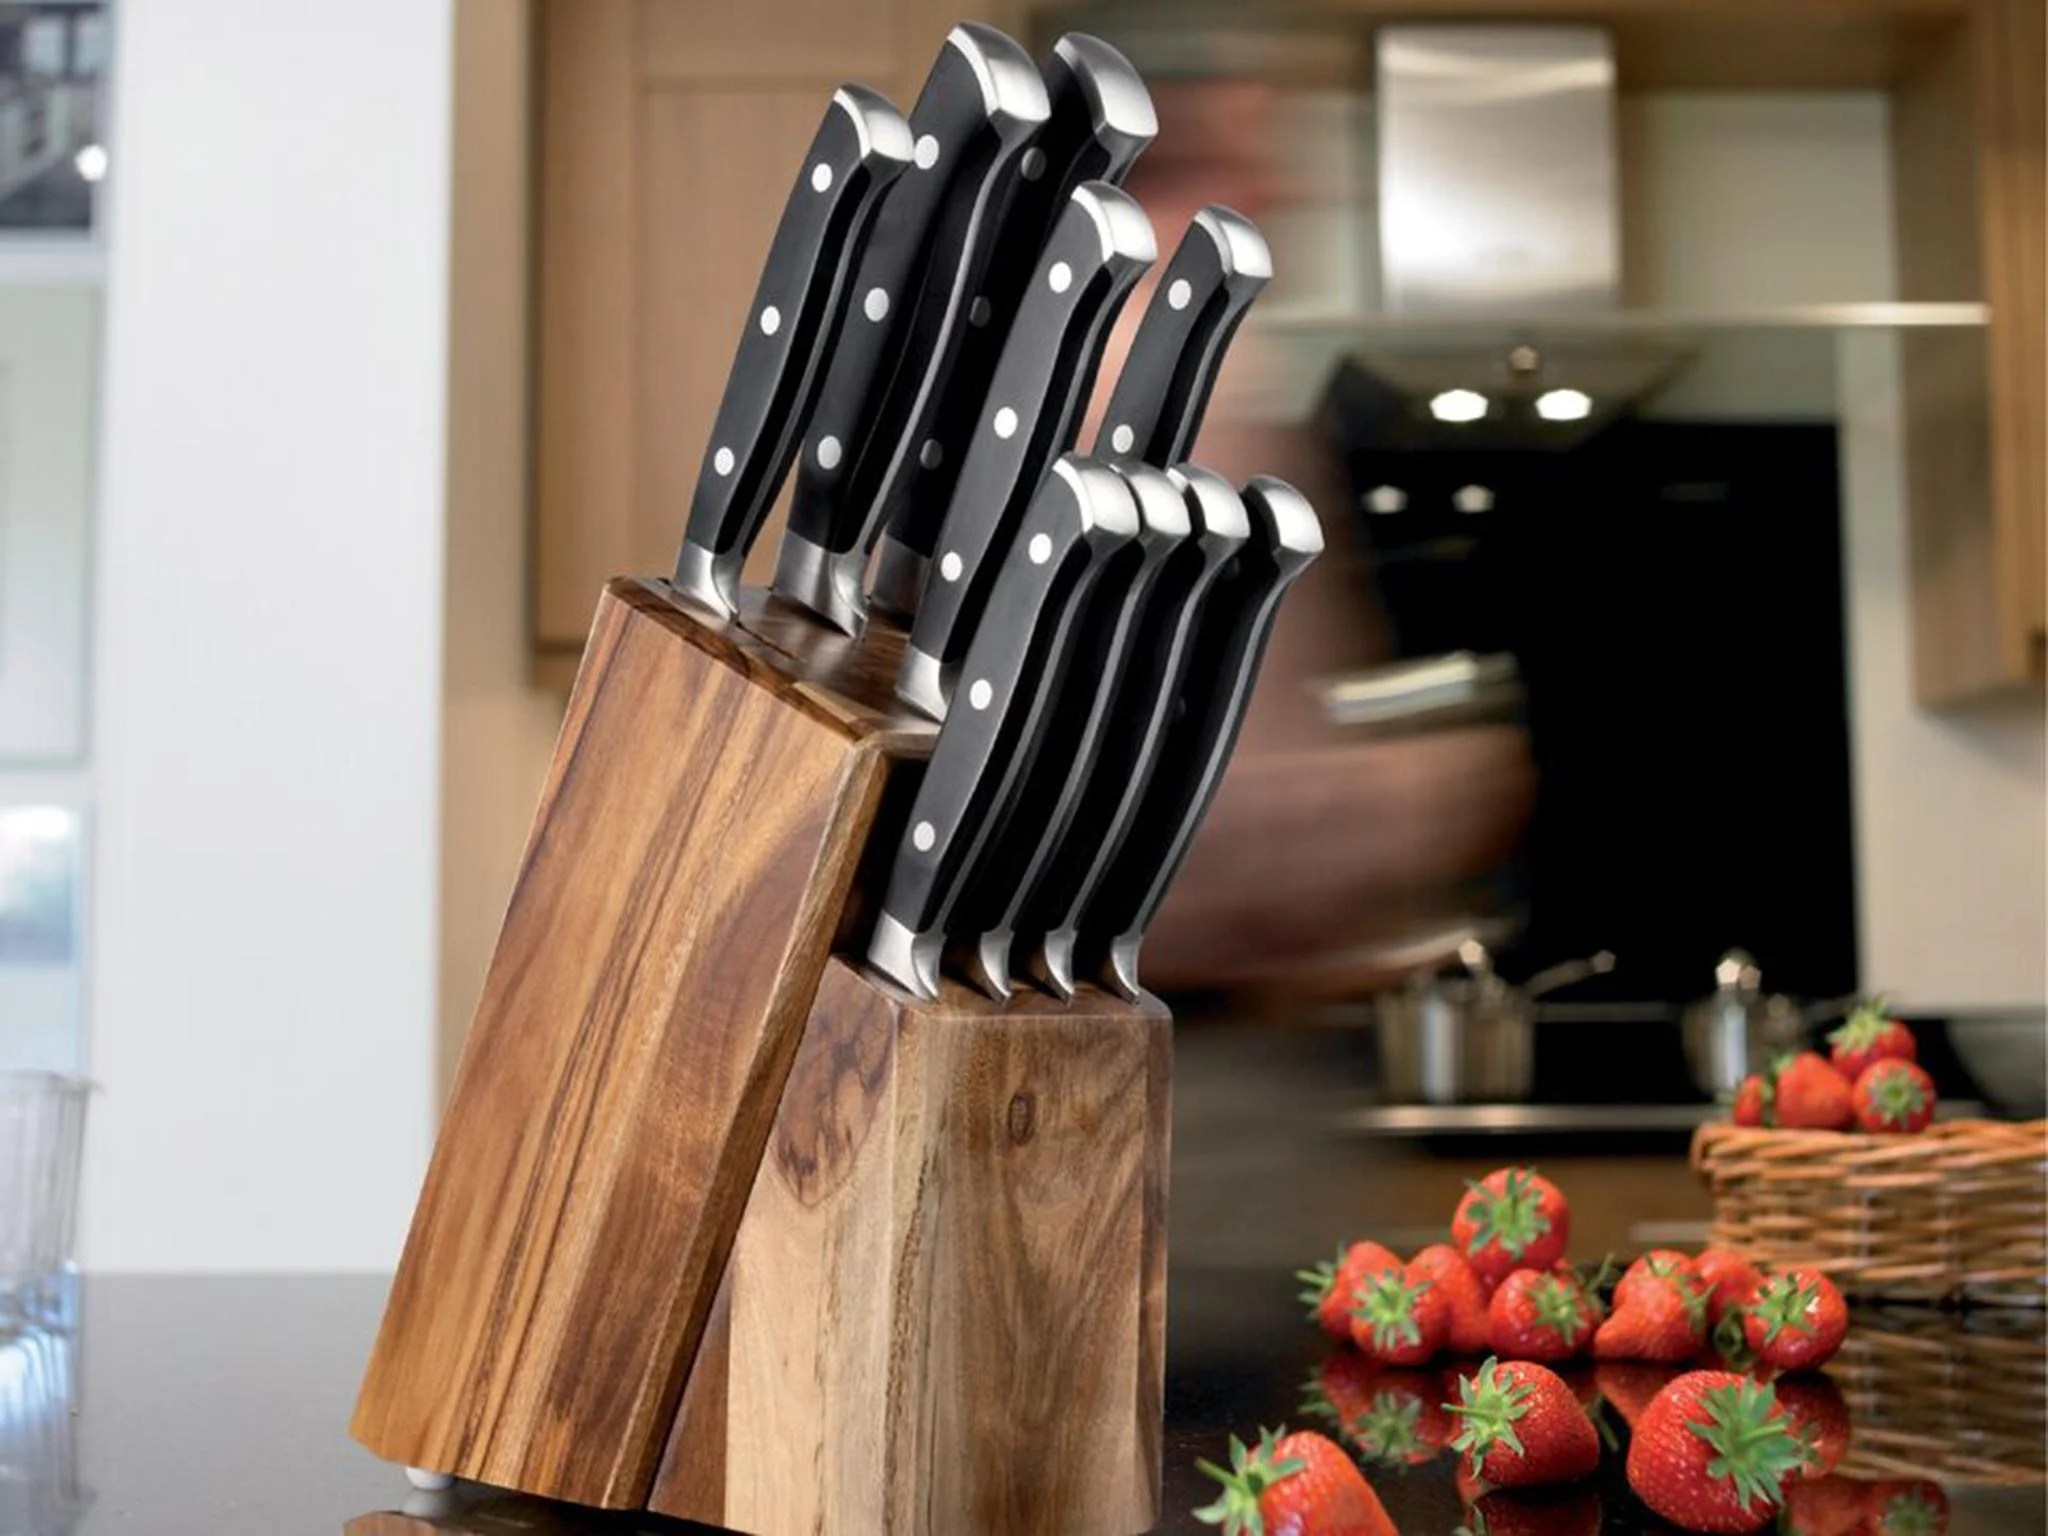 kitchen knives sets sprayer hose 15 best knife the independent taylor s eye witness set includes four steak